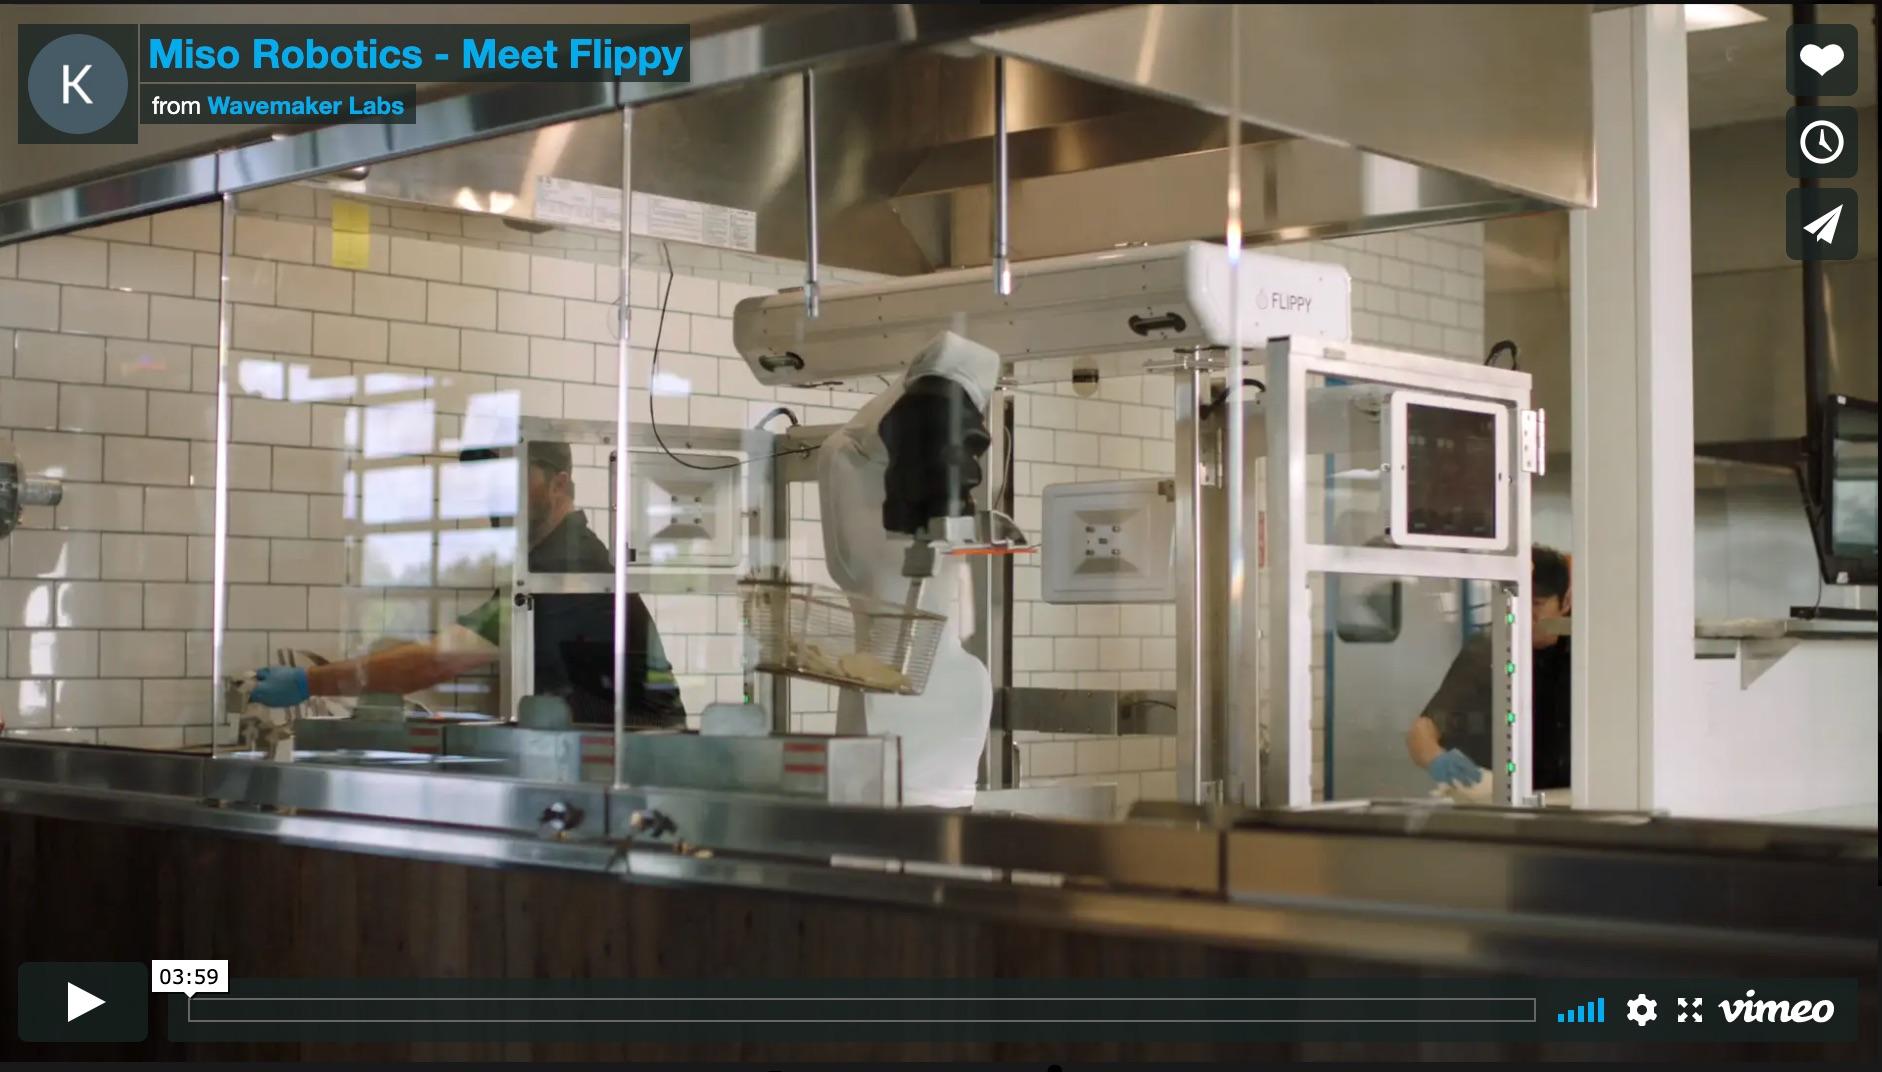 miso-robotics-kitchen-robot